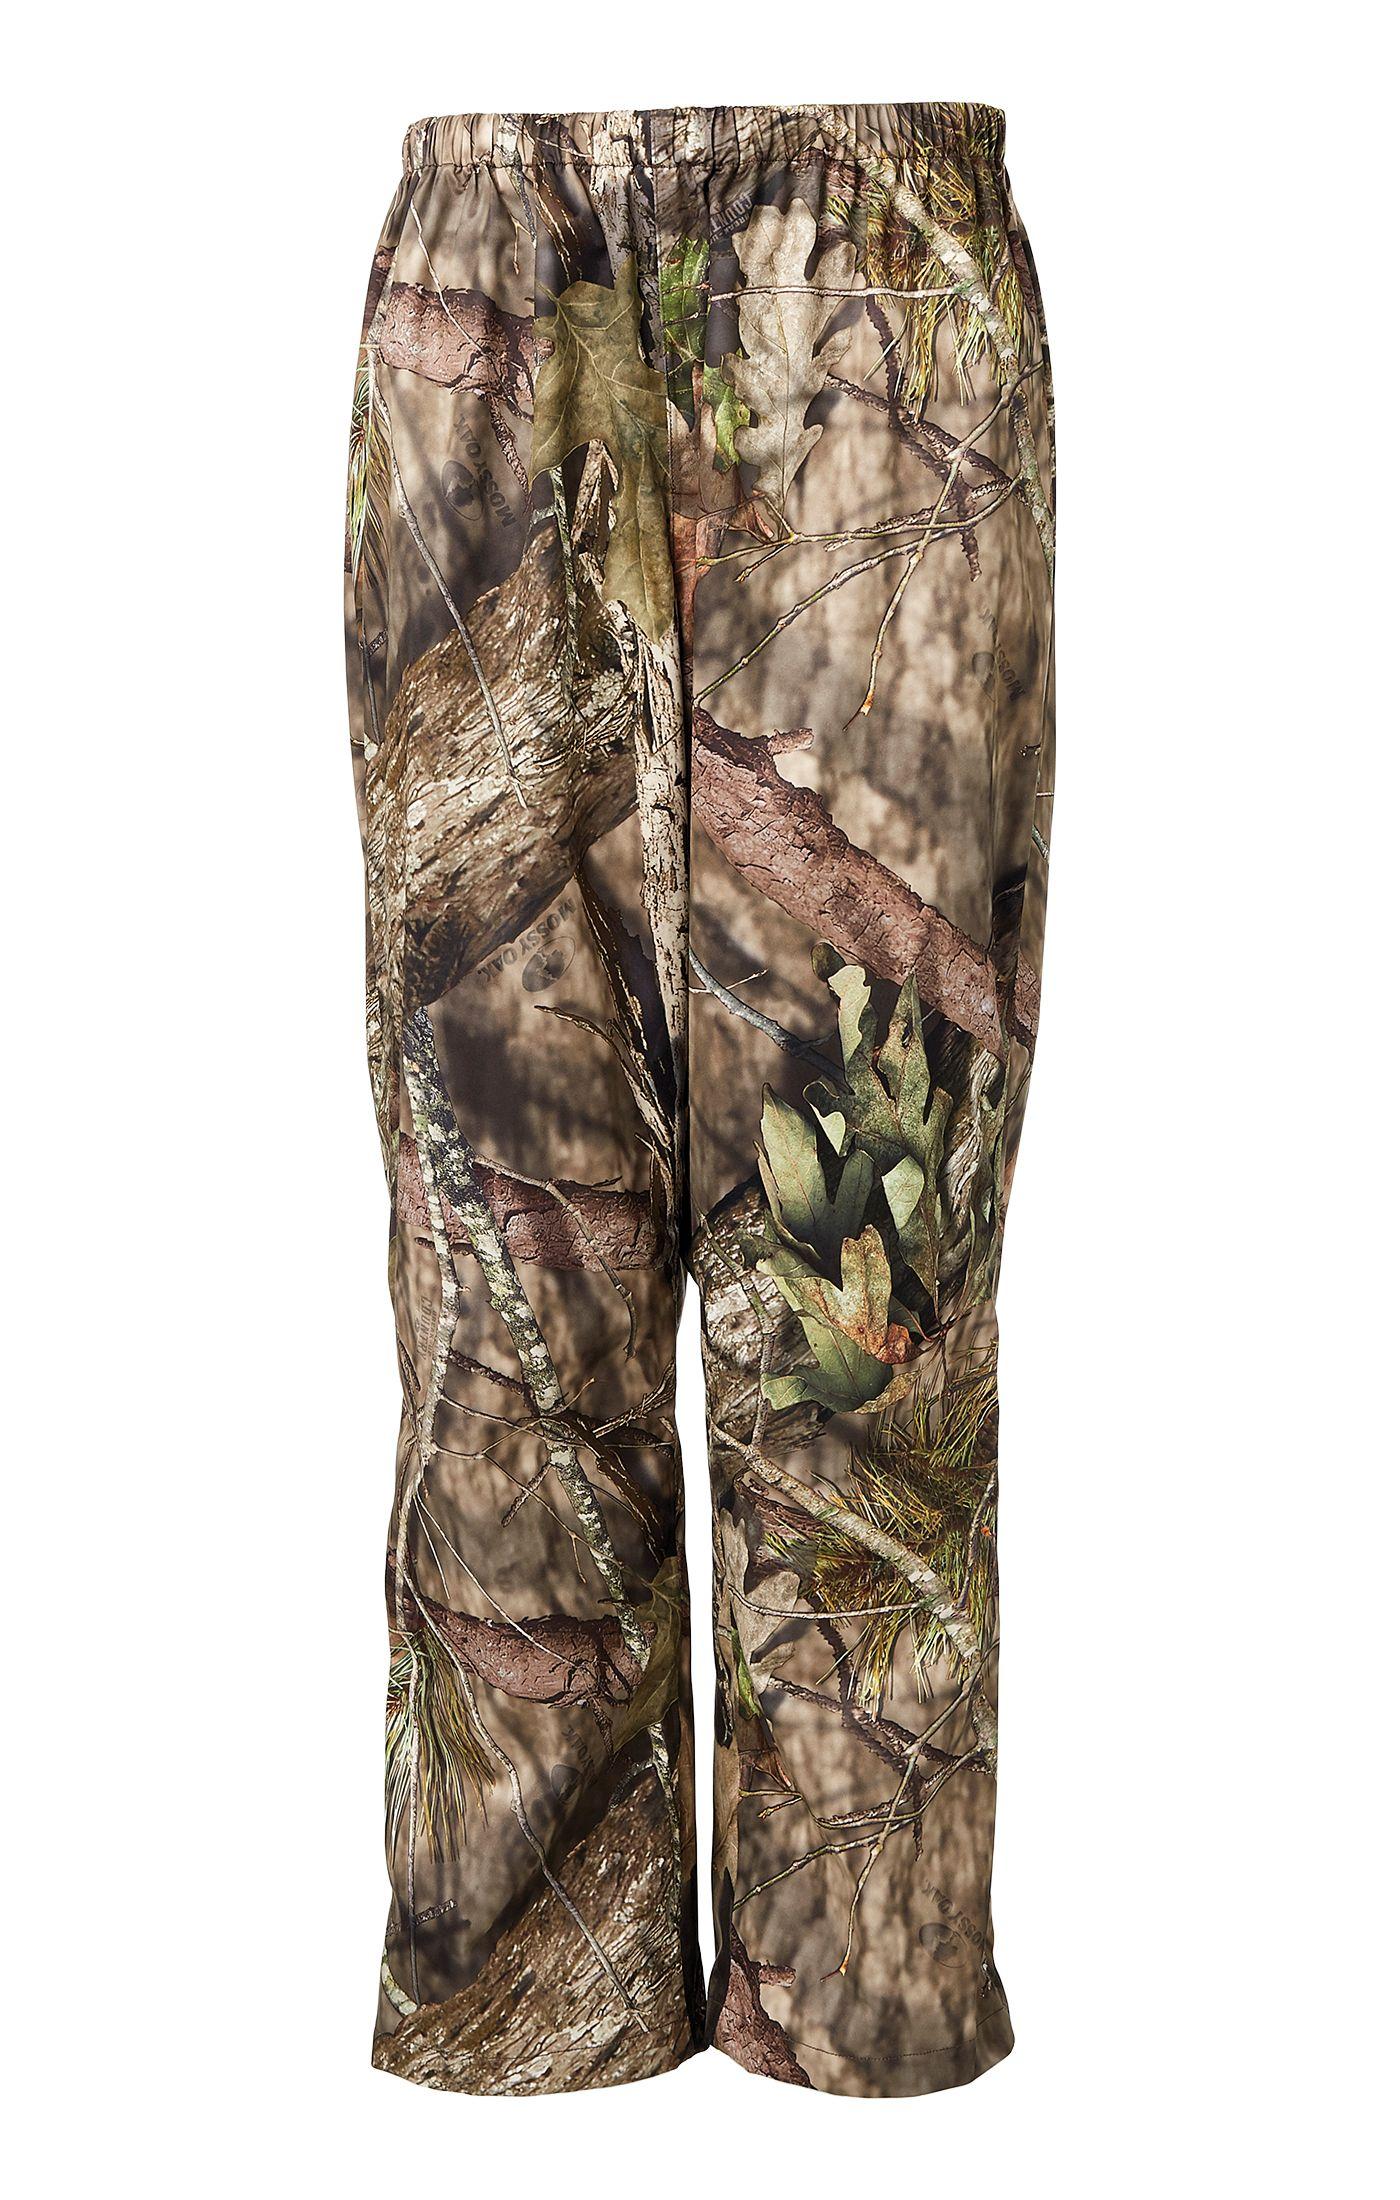 Field & Stream Men's Every Hunt Packable Rain Pants